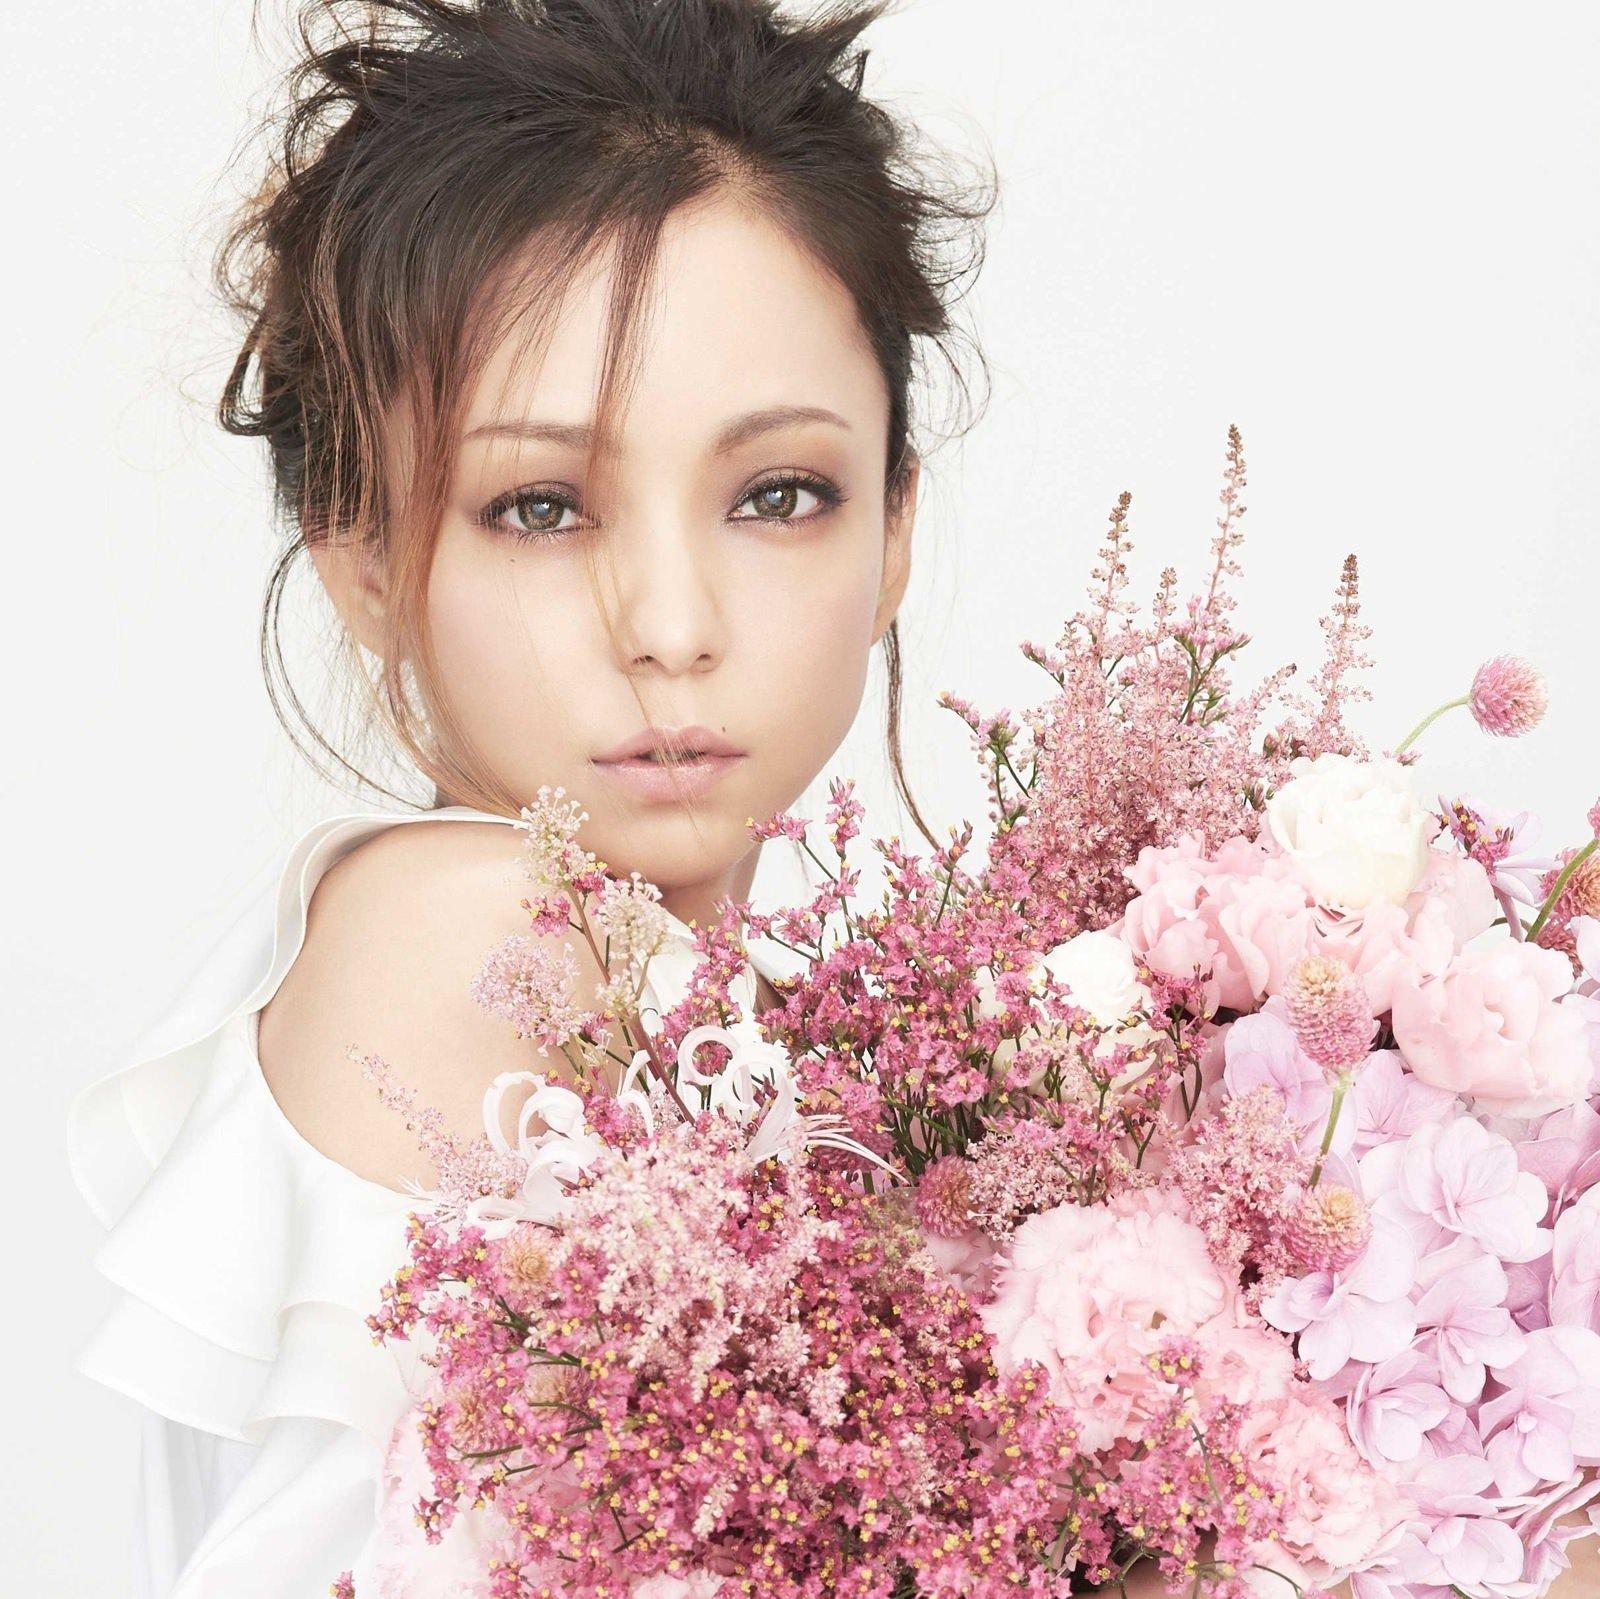 [Single] 安室奈美恵 (Namie Amuro) – BRIGHTER DAY [FLAC / 24bit Lossless / WEB] [2014.11.12]